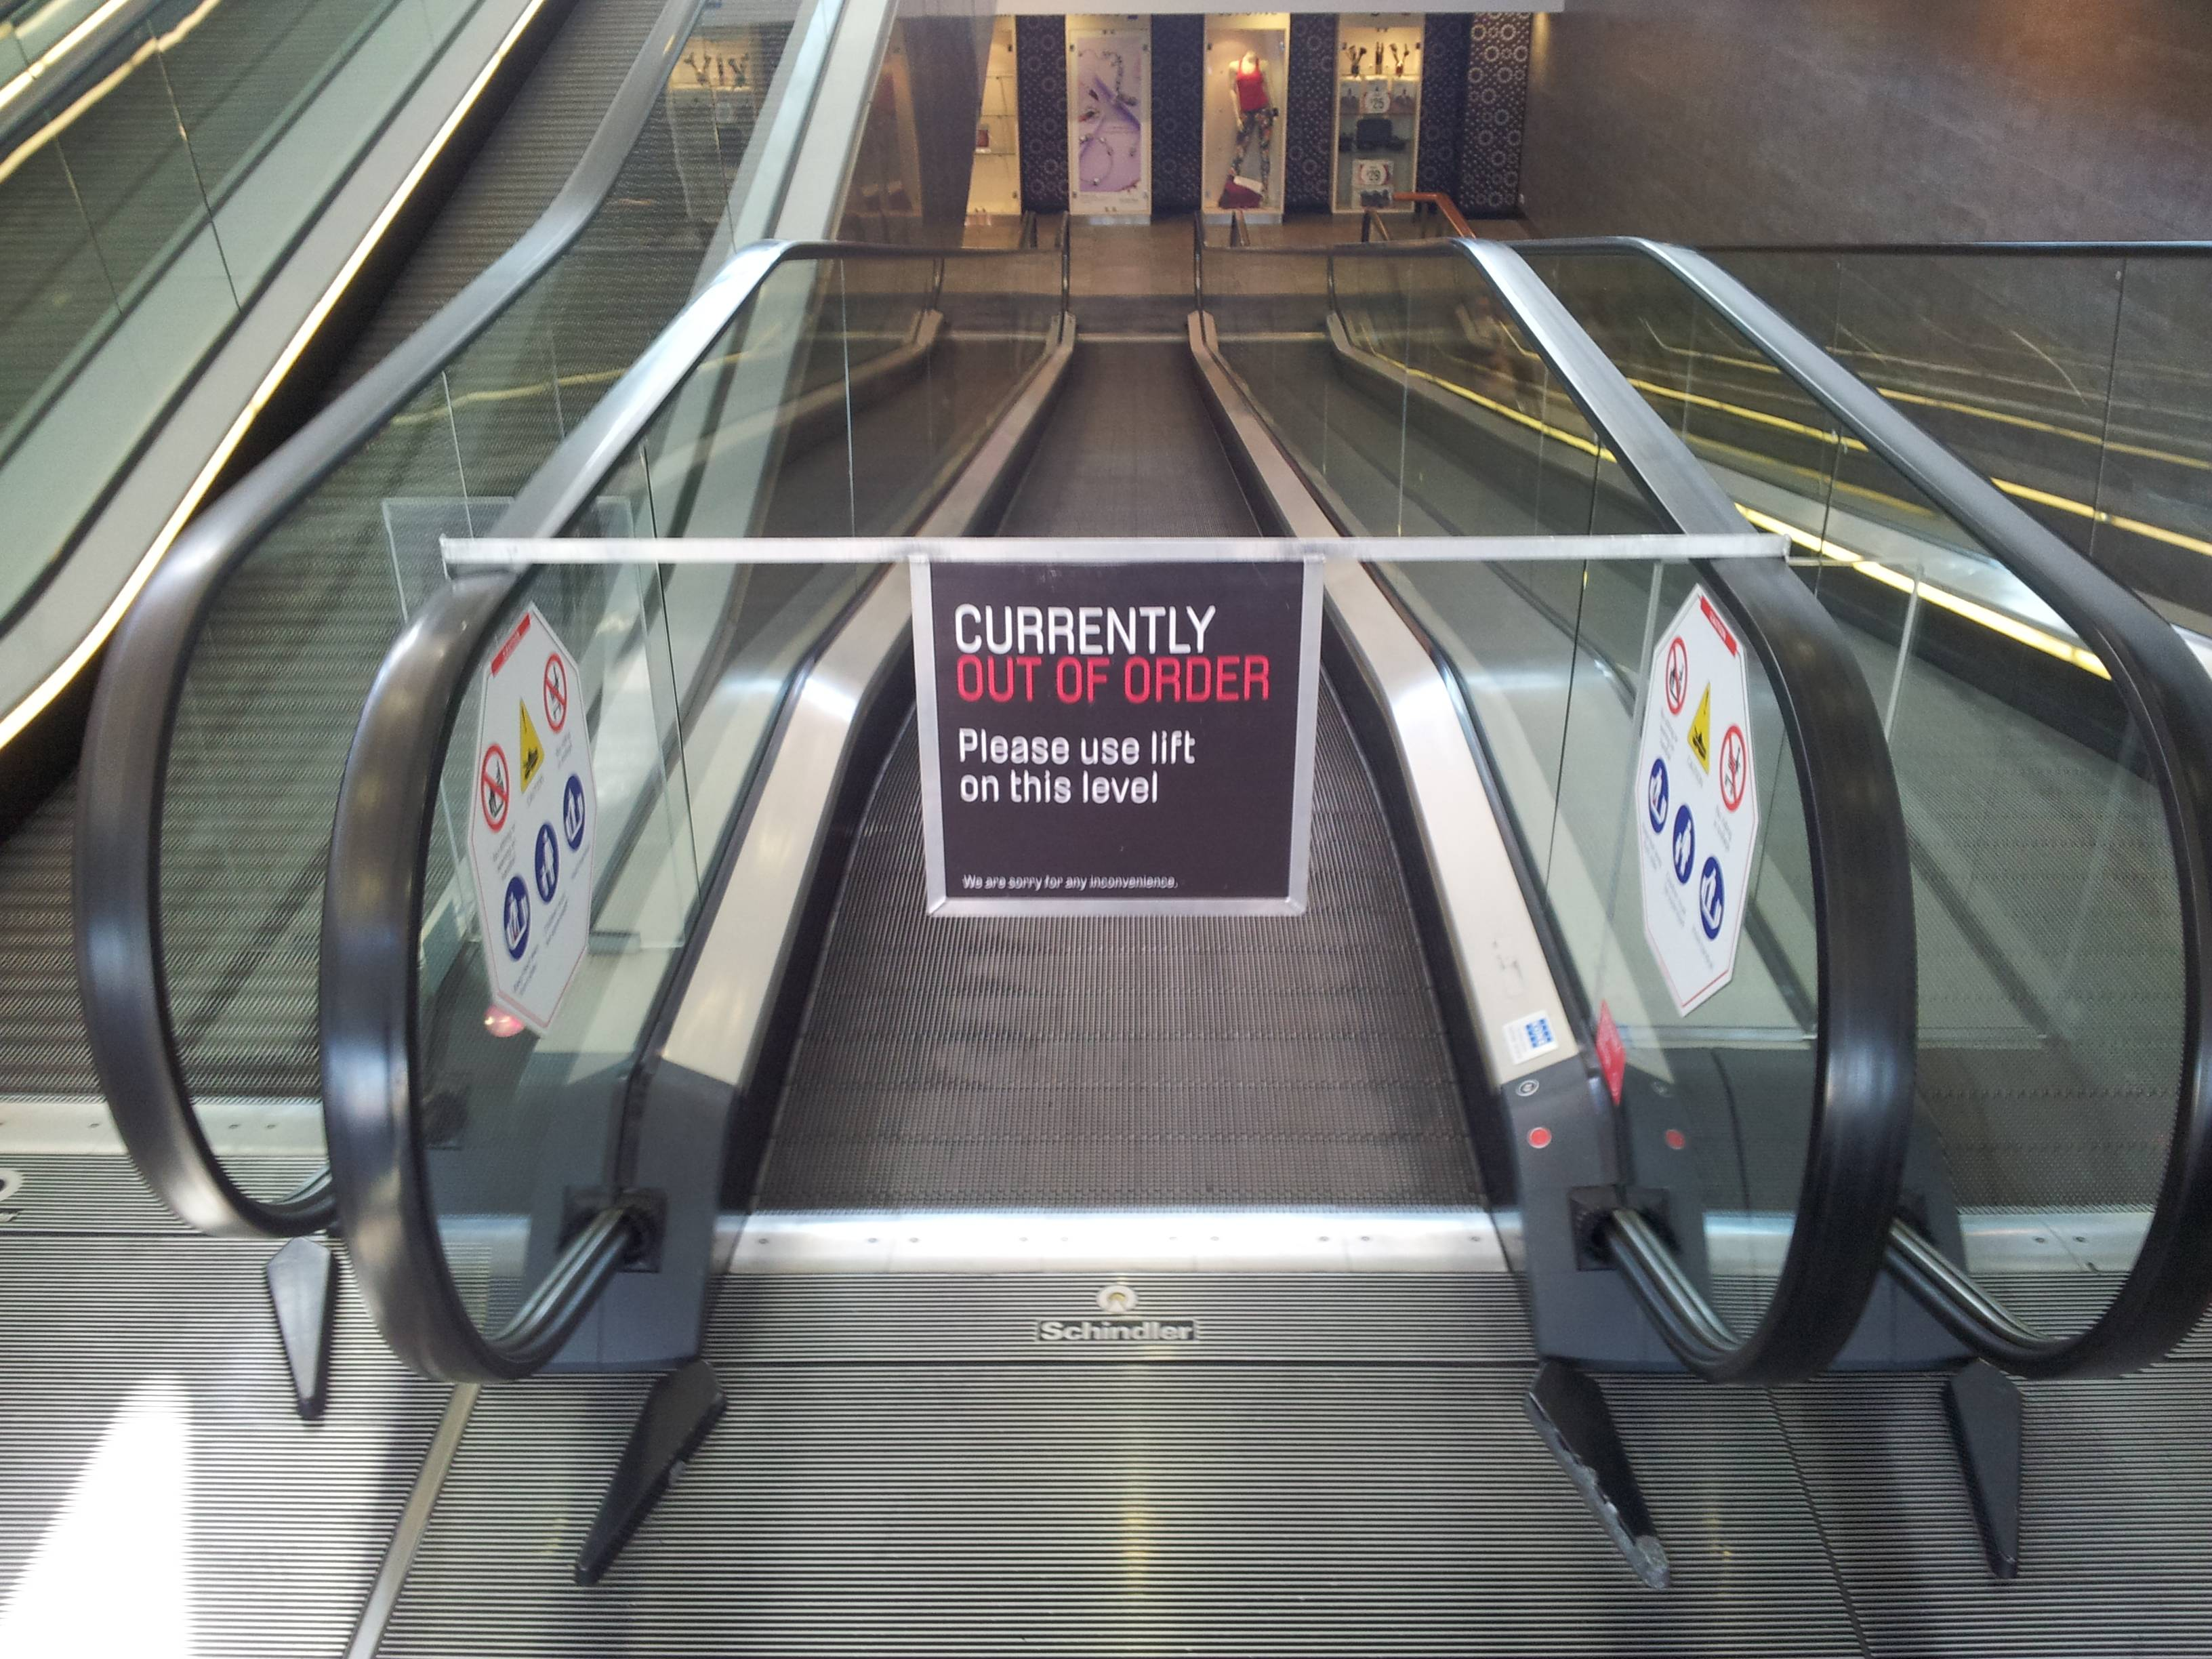 Broken escalator joke